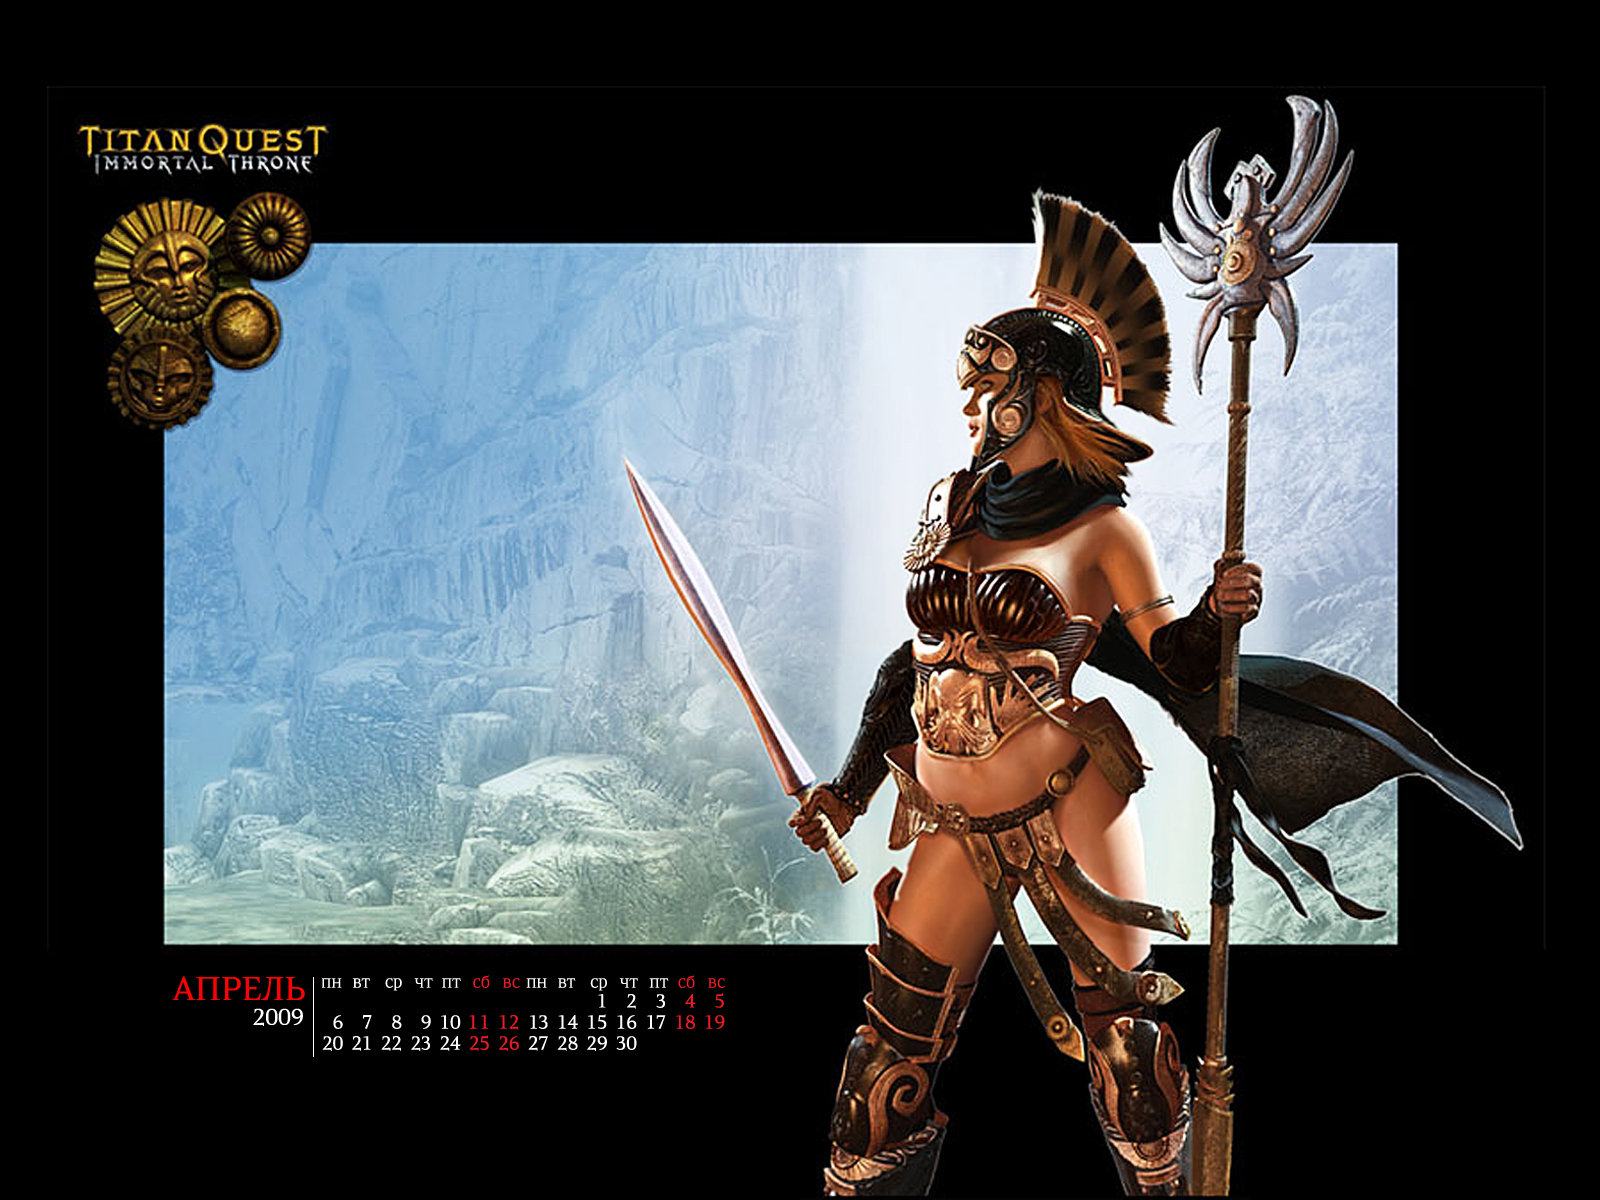 Titan quest nudes fucks clips